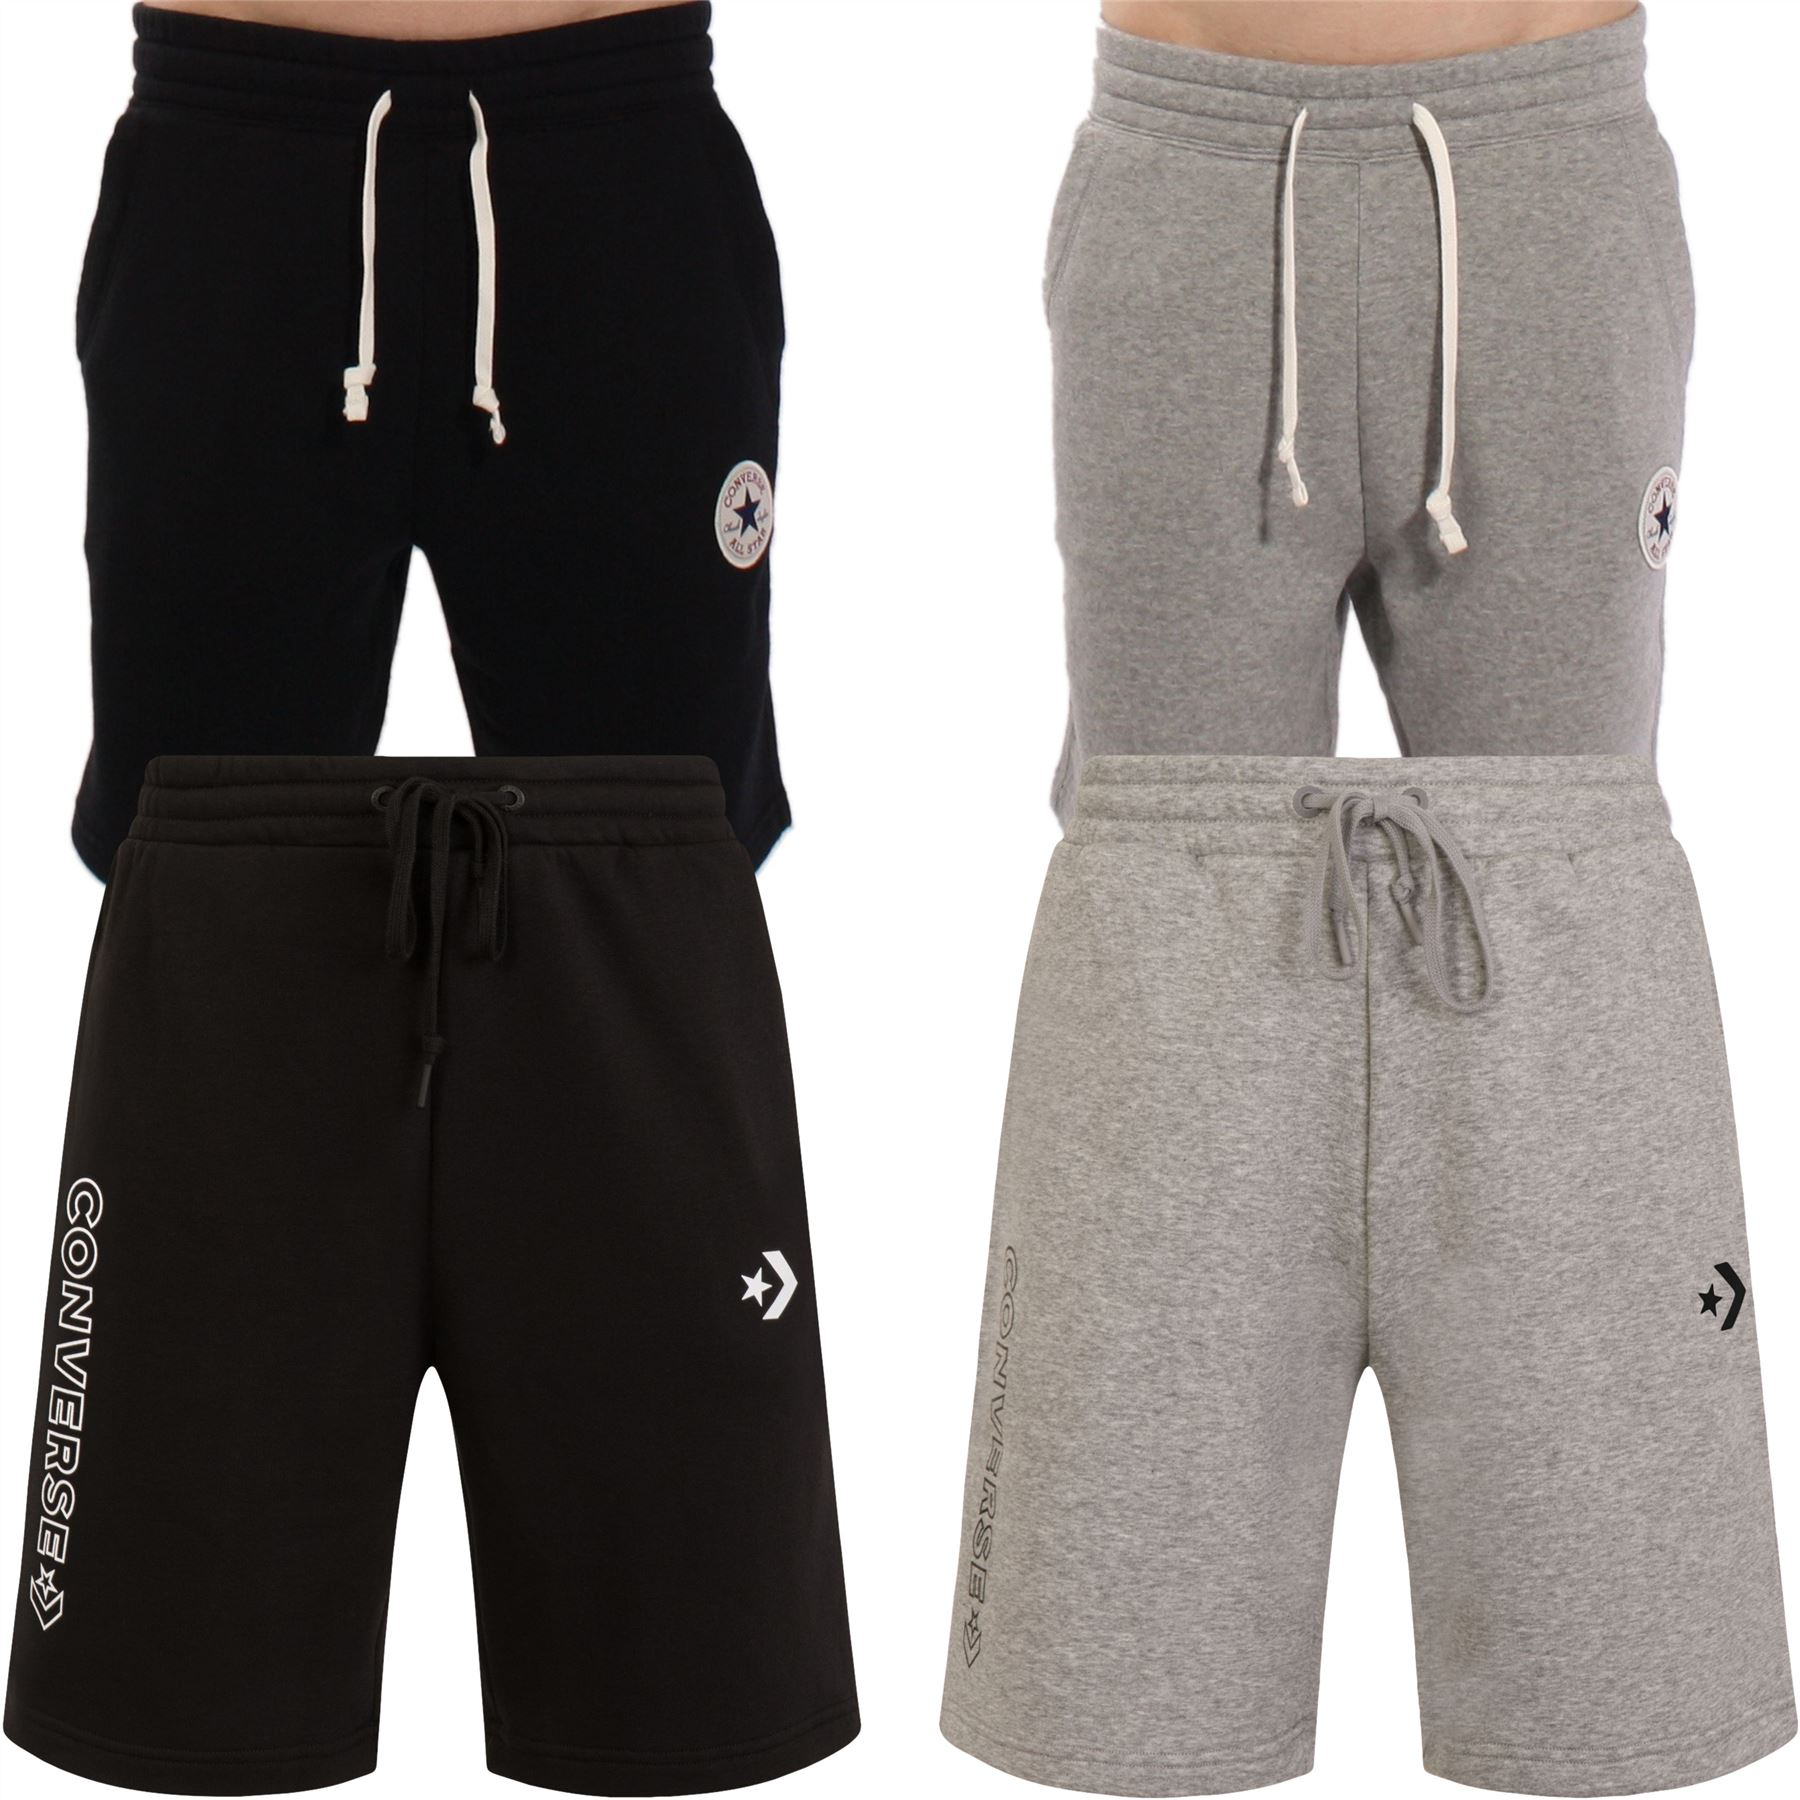 2converse pantaloncini